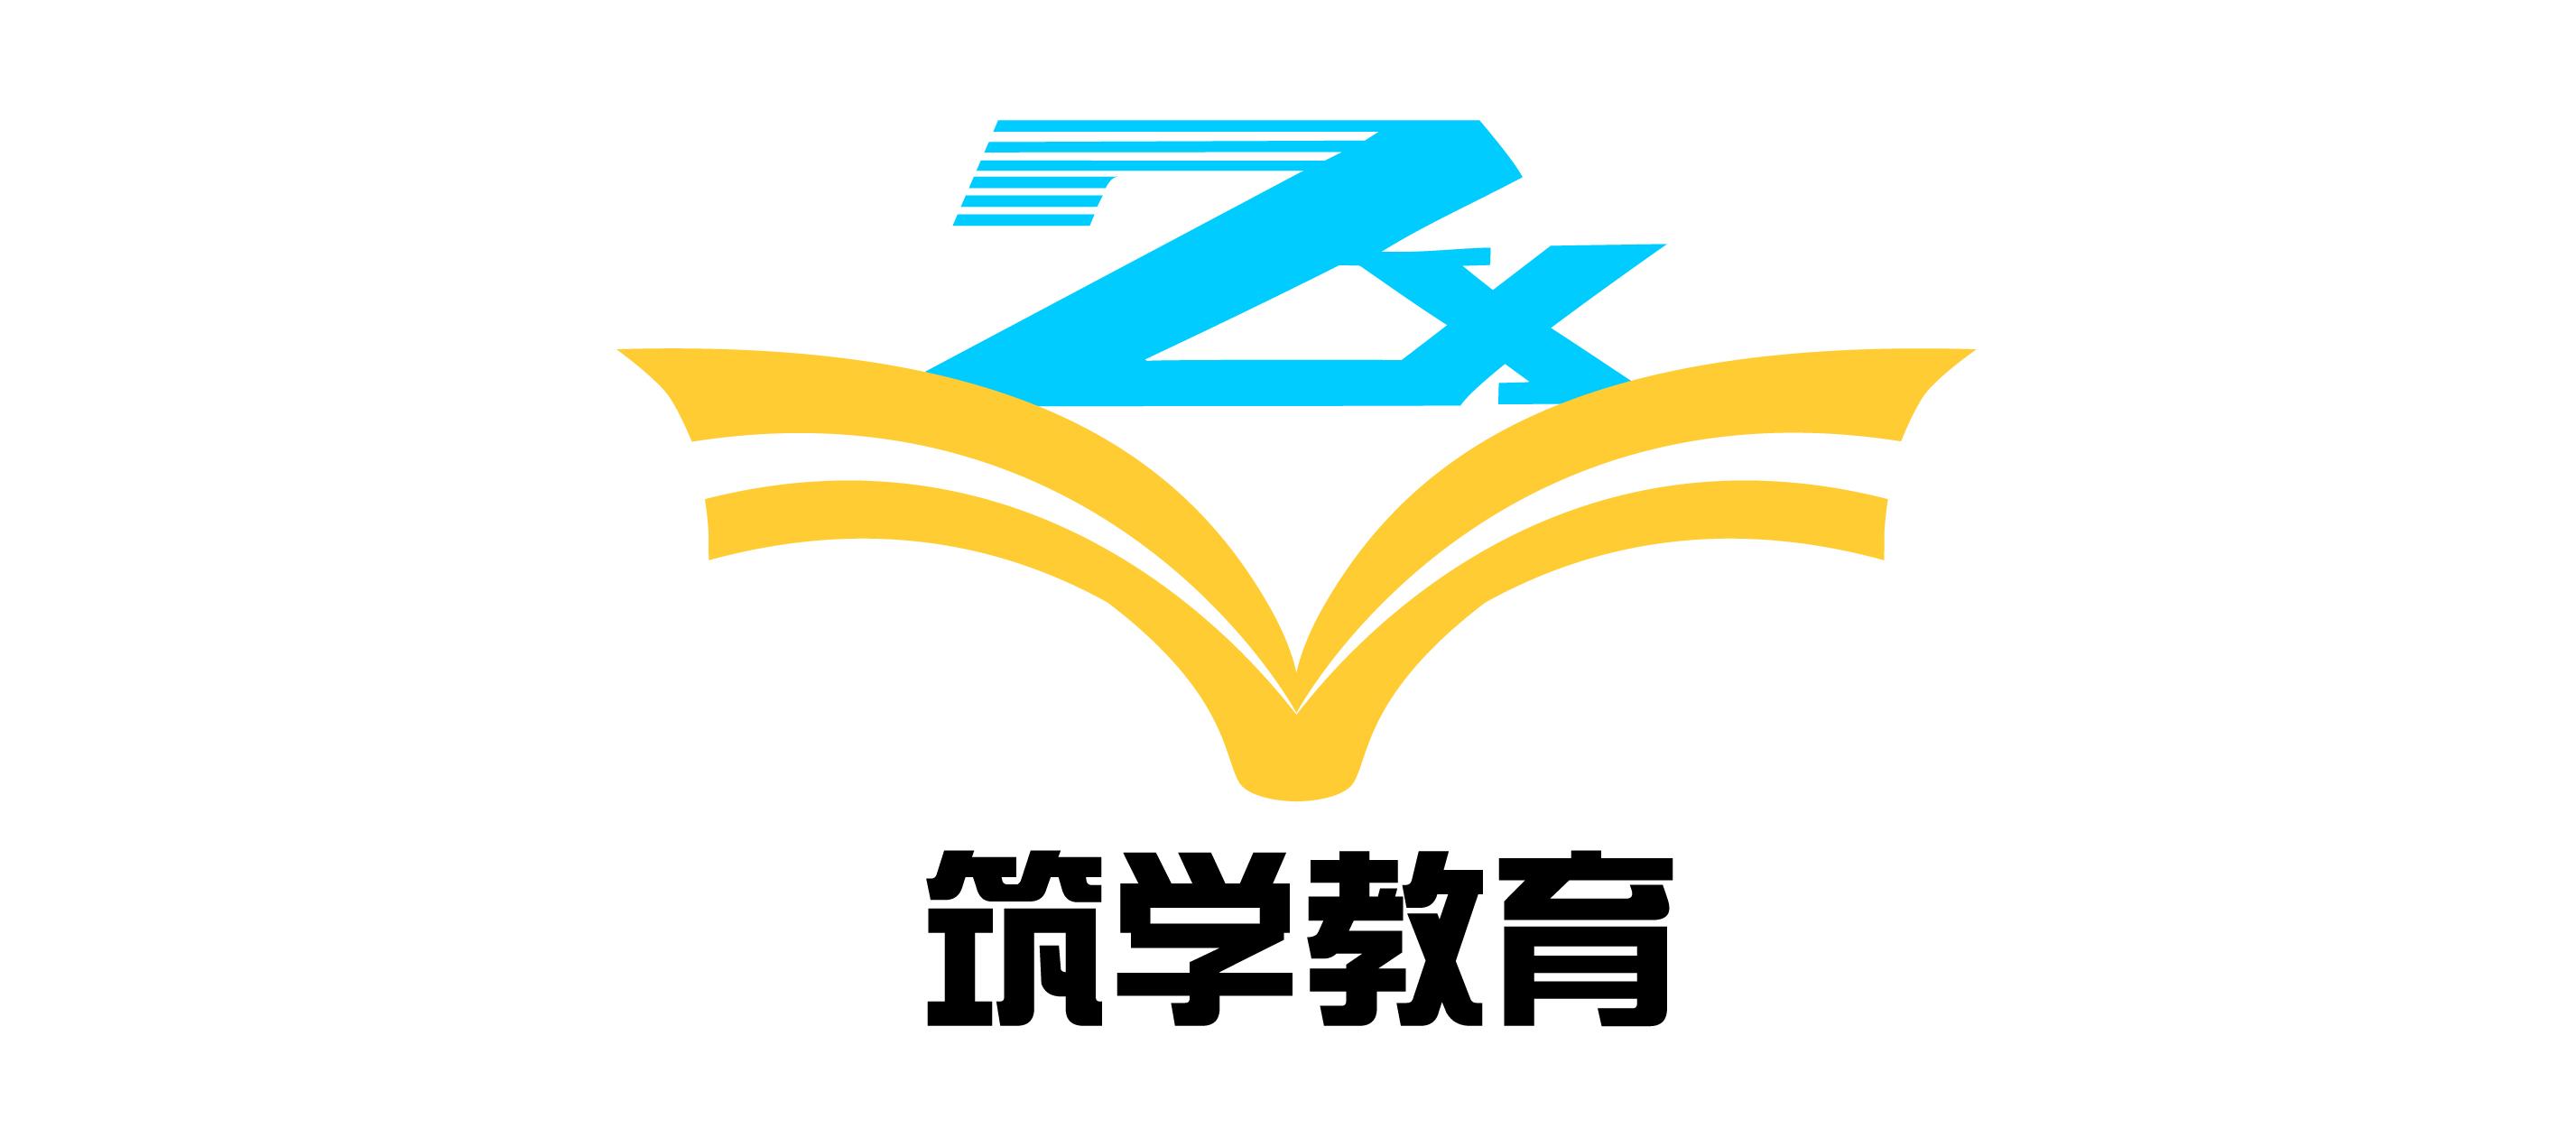 教育机构logo设计_vorever案例展示